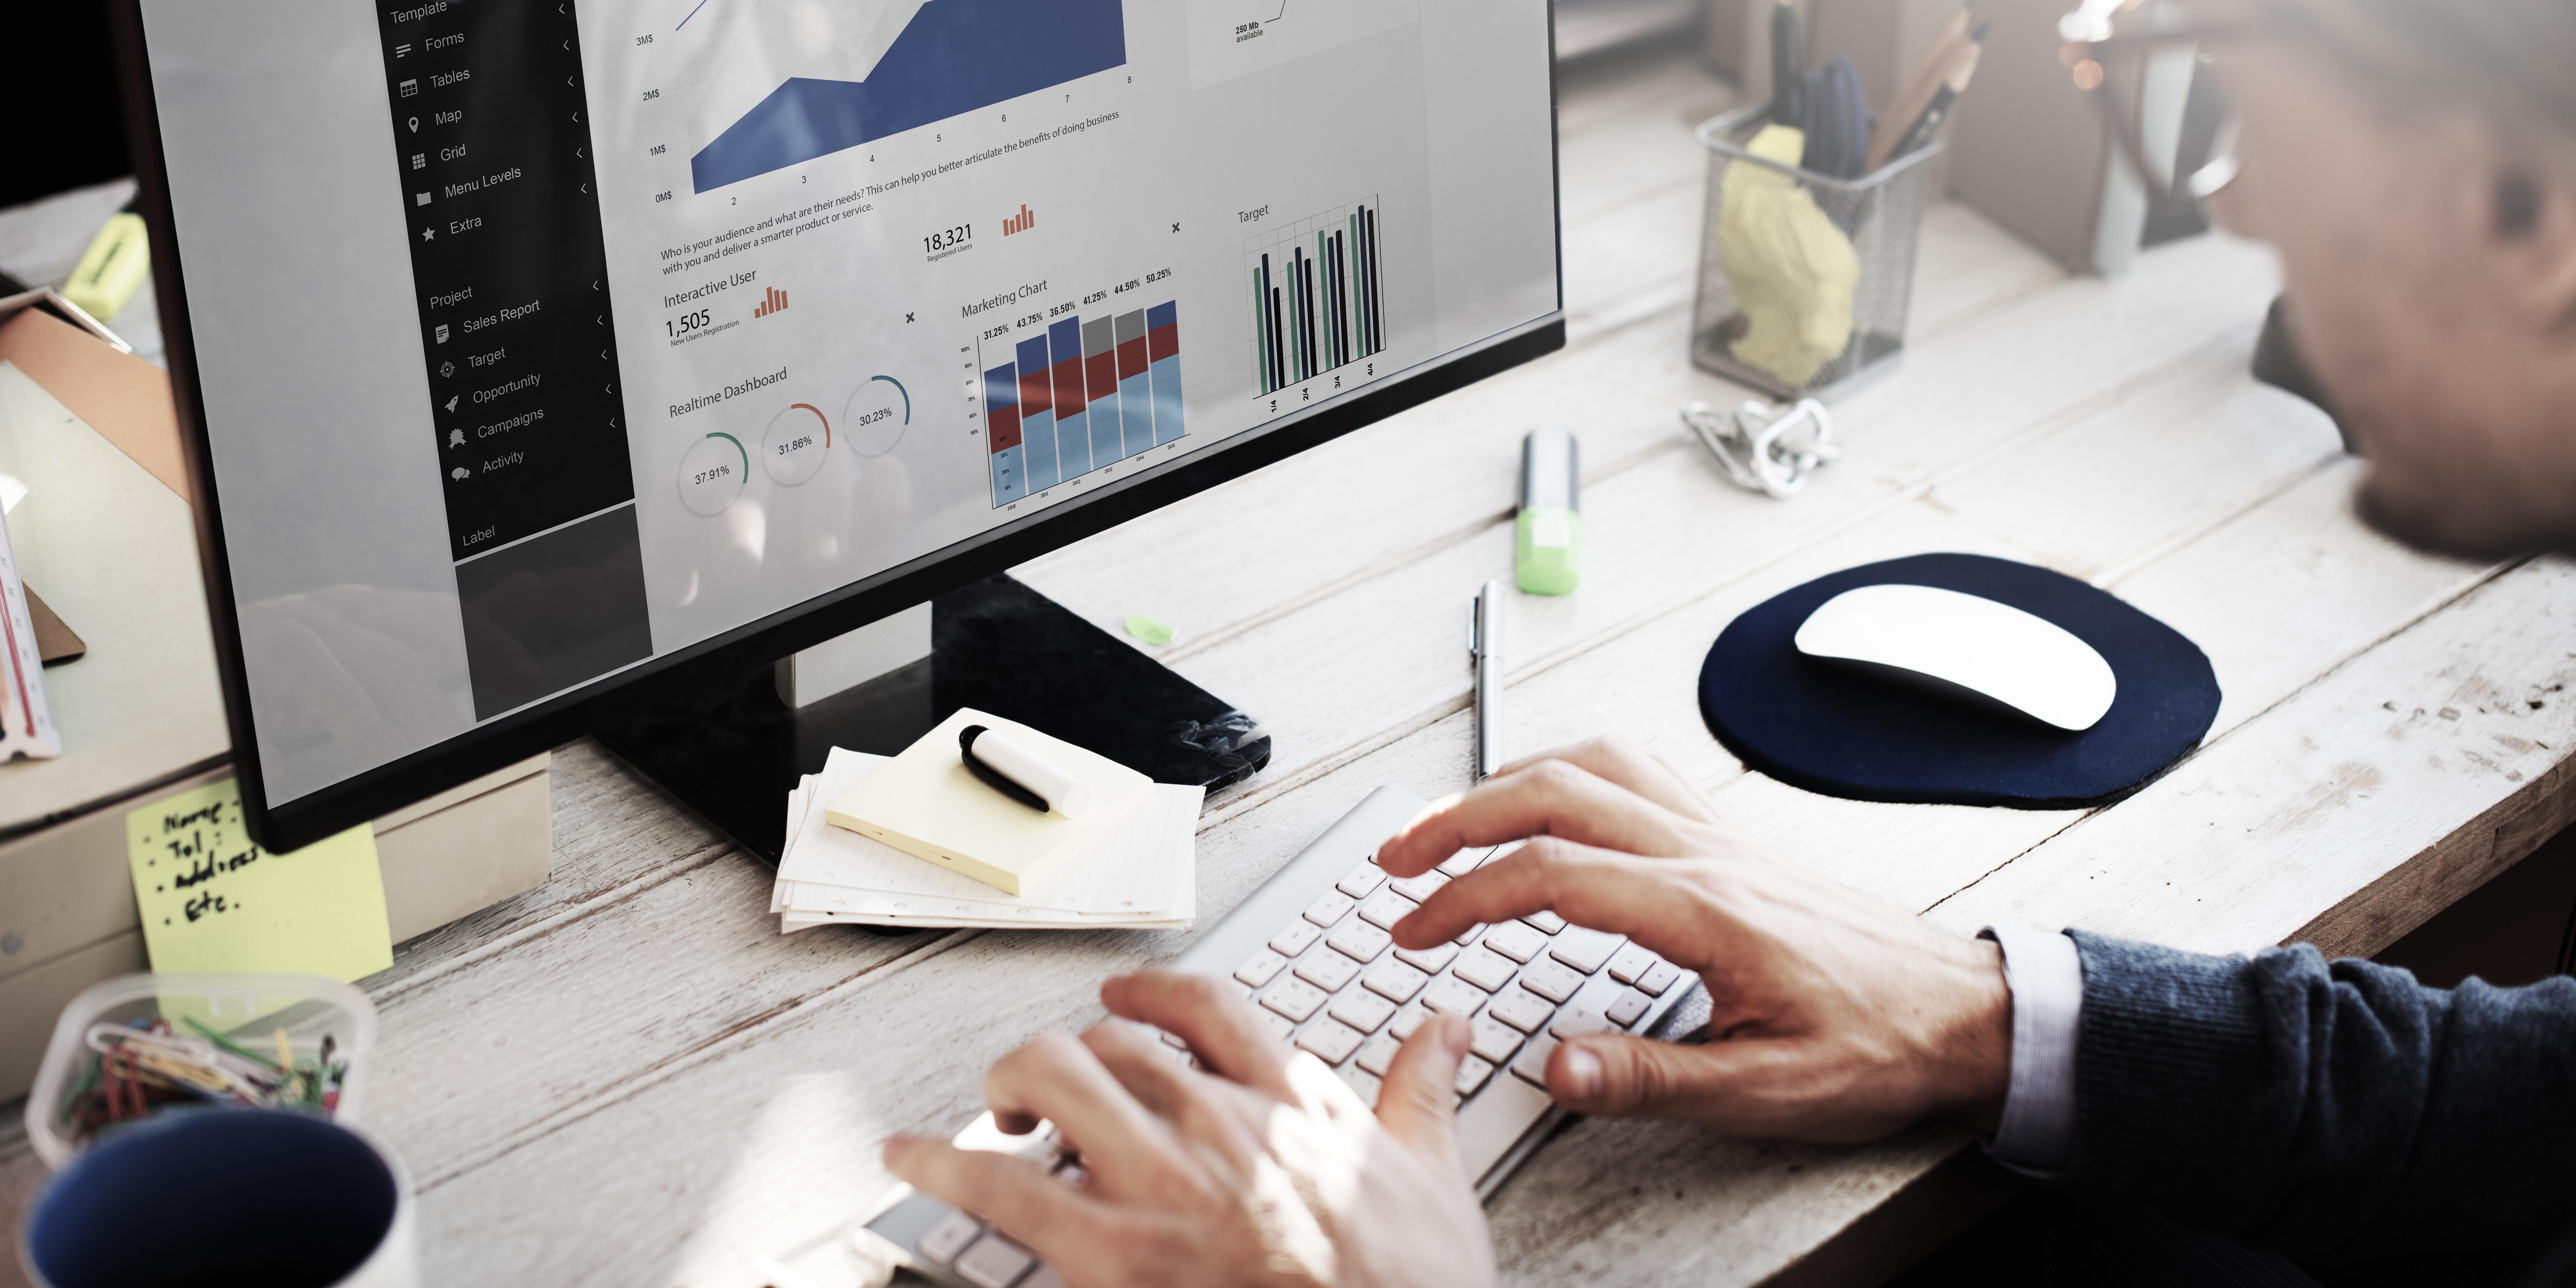 Data analyst creating visualizations